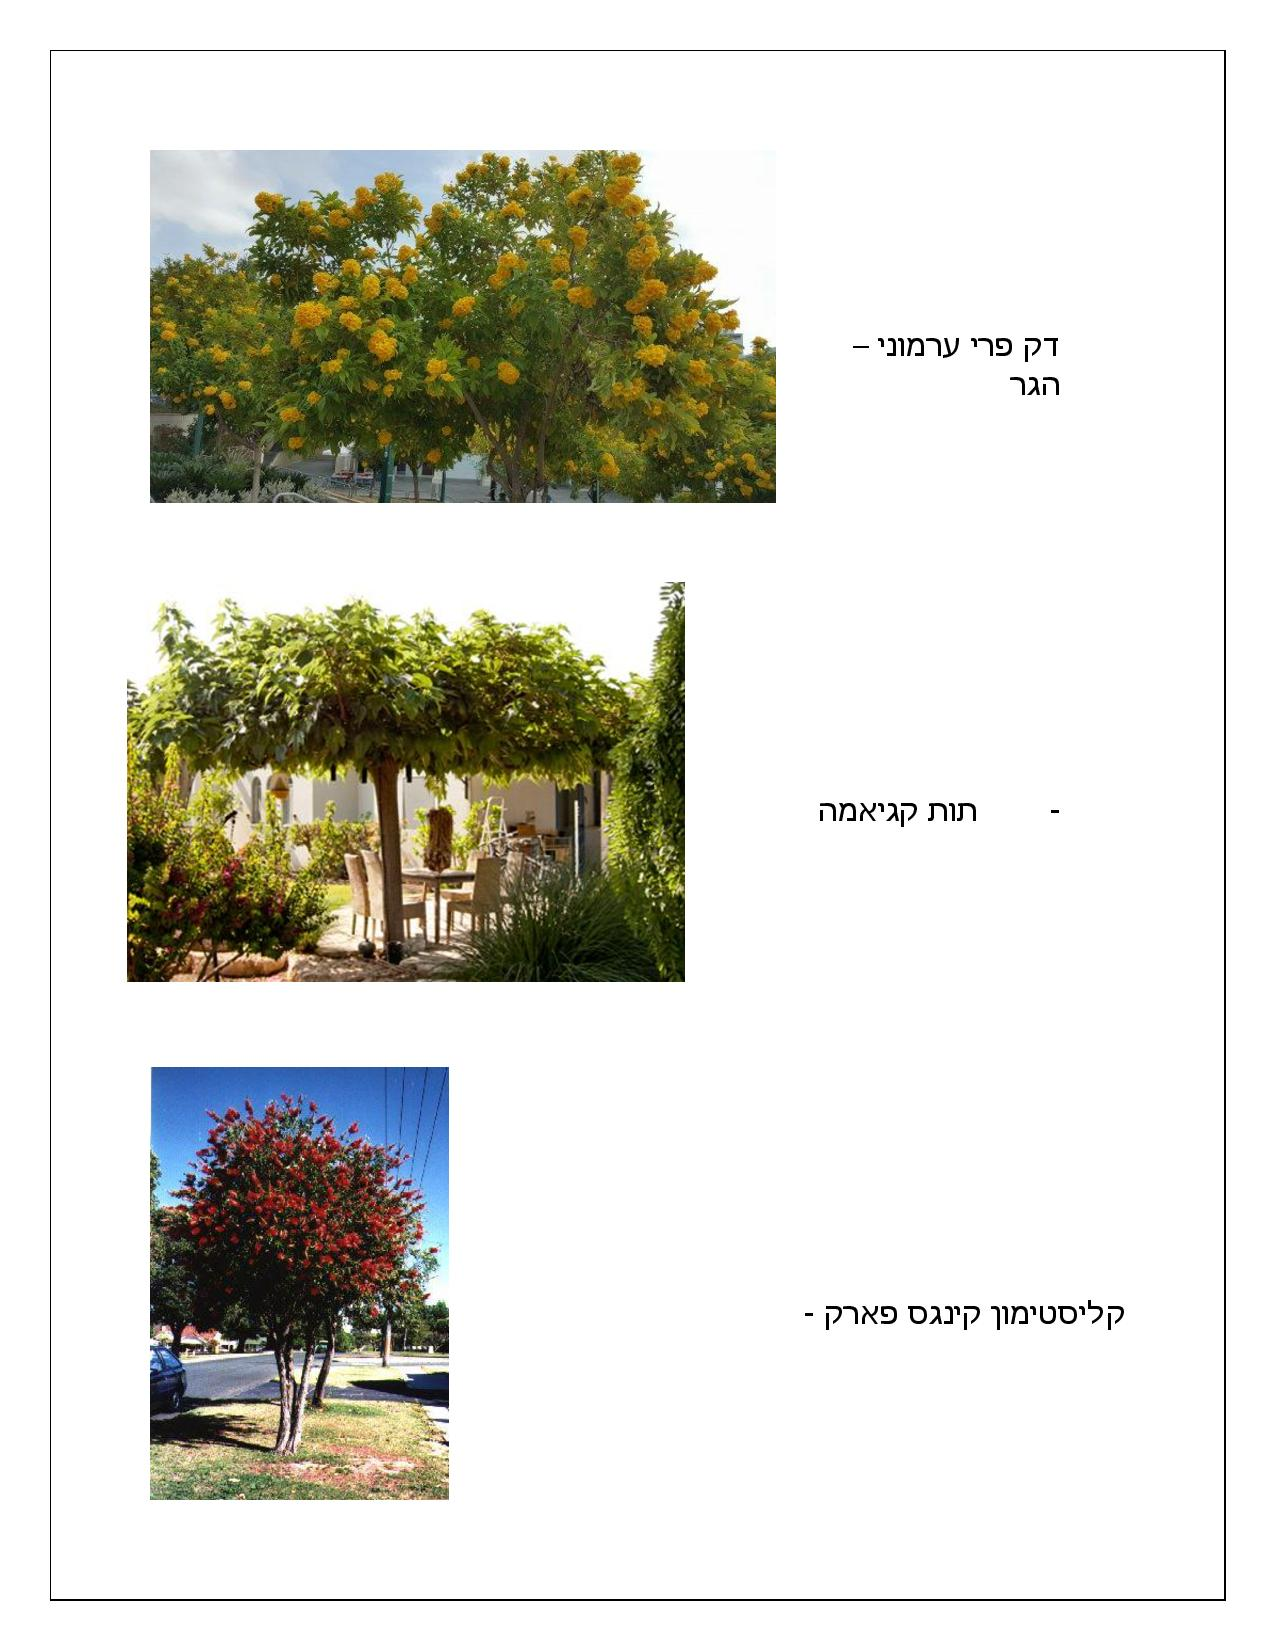 Document page 009 - דוגמא להצעת מחיר עבור עיצוב גינה